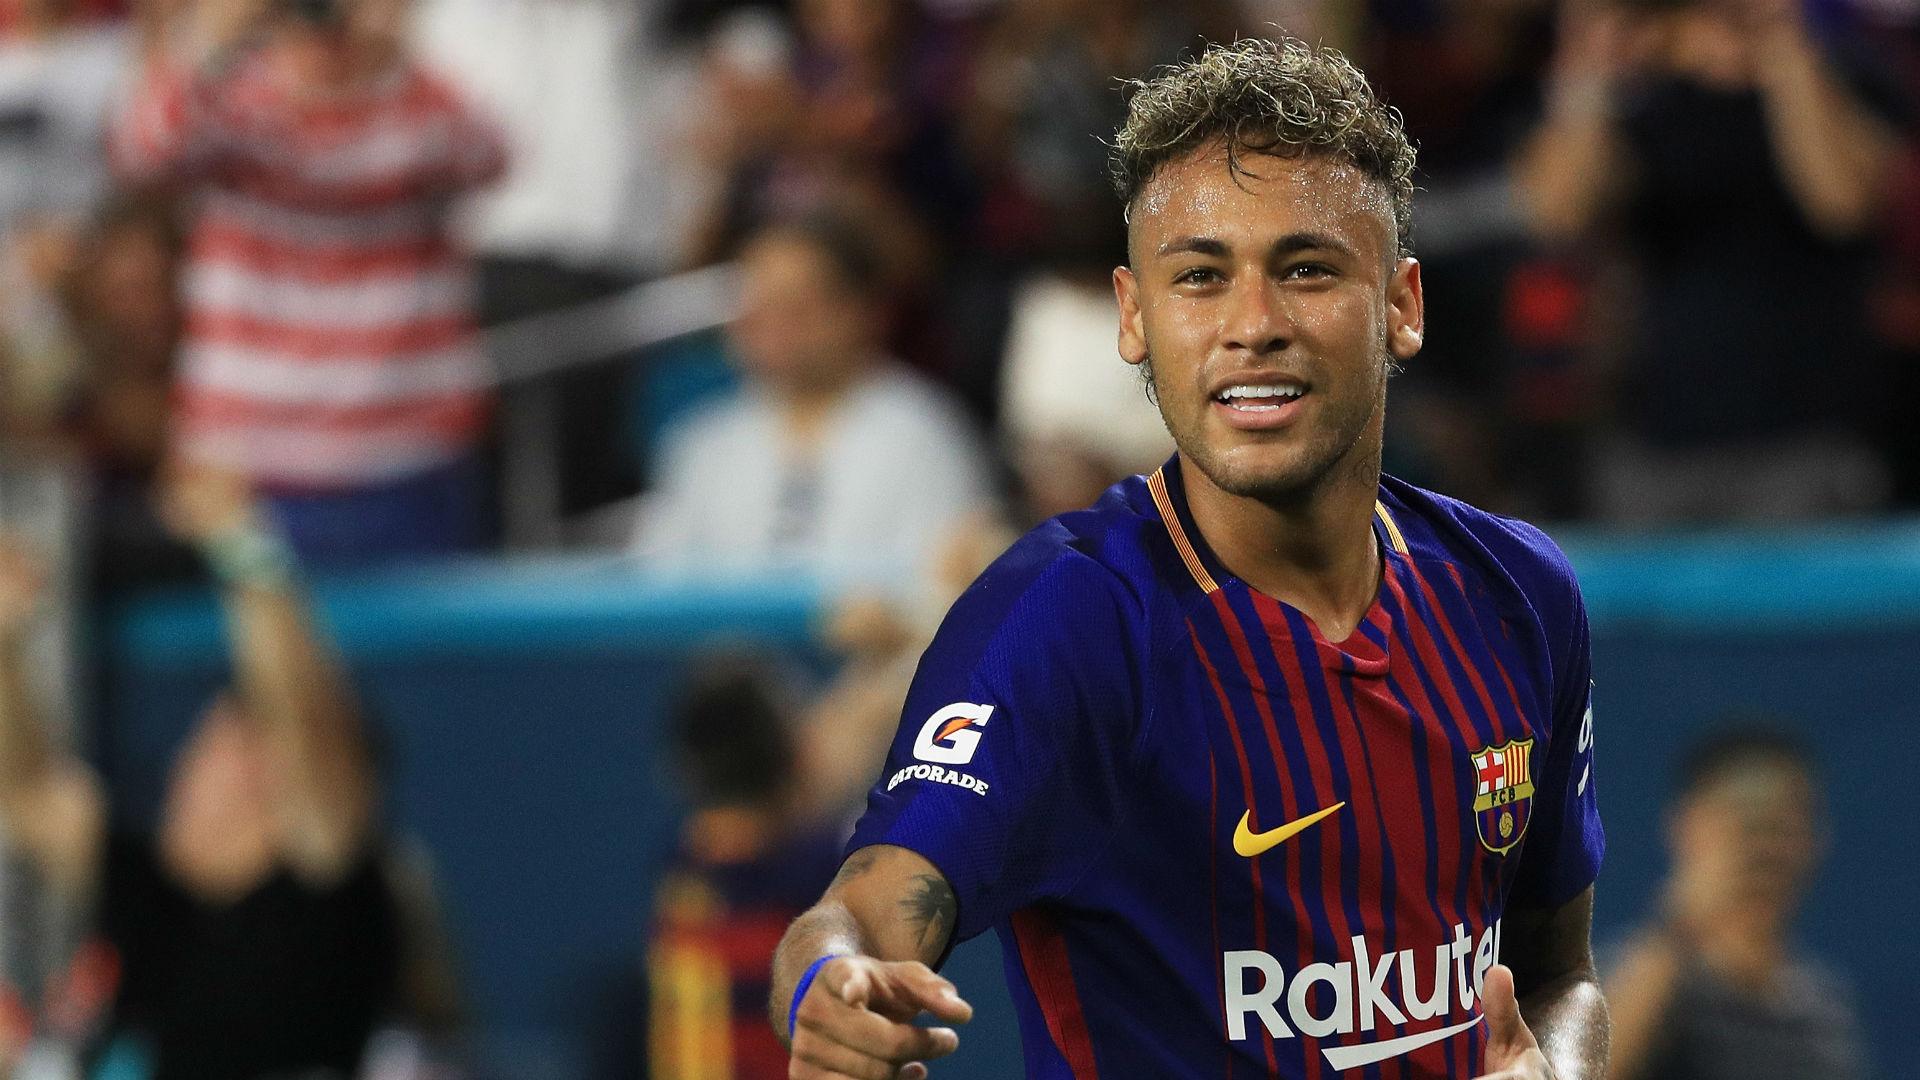 Berita Transfer - Kalahkan PSG 6-1 Bersama Barcelona Adalah Memori Paling Favorit Neymar | Goal.com